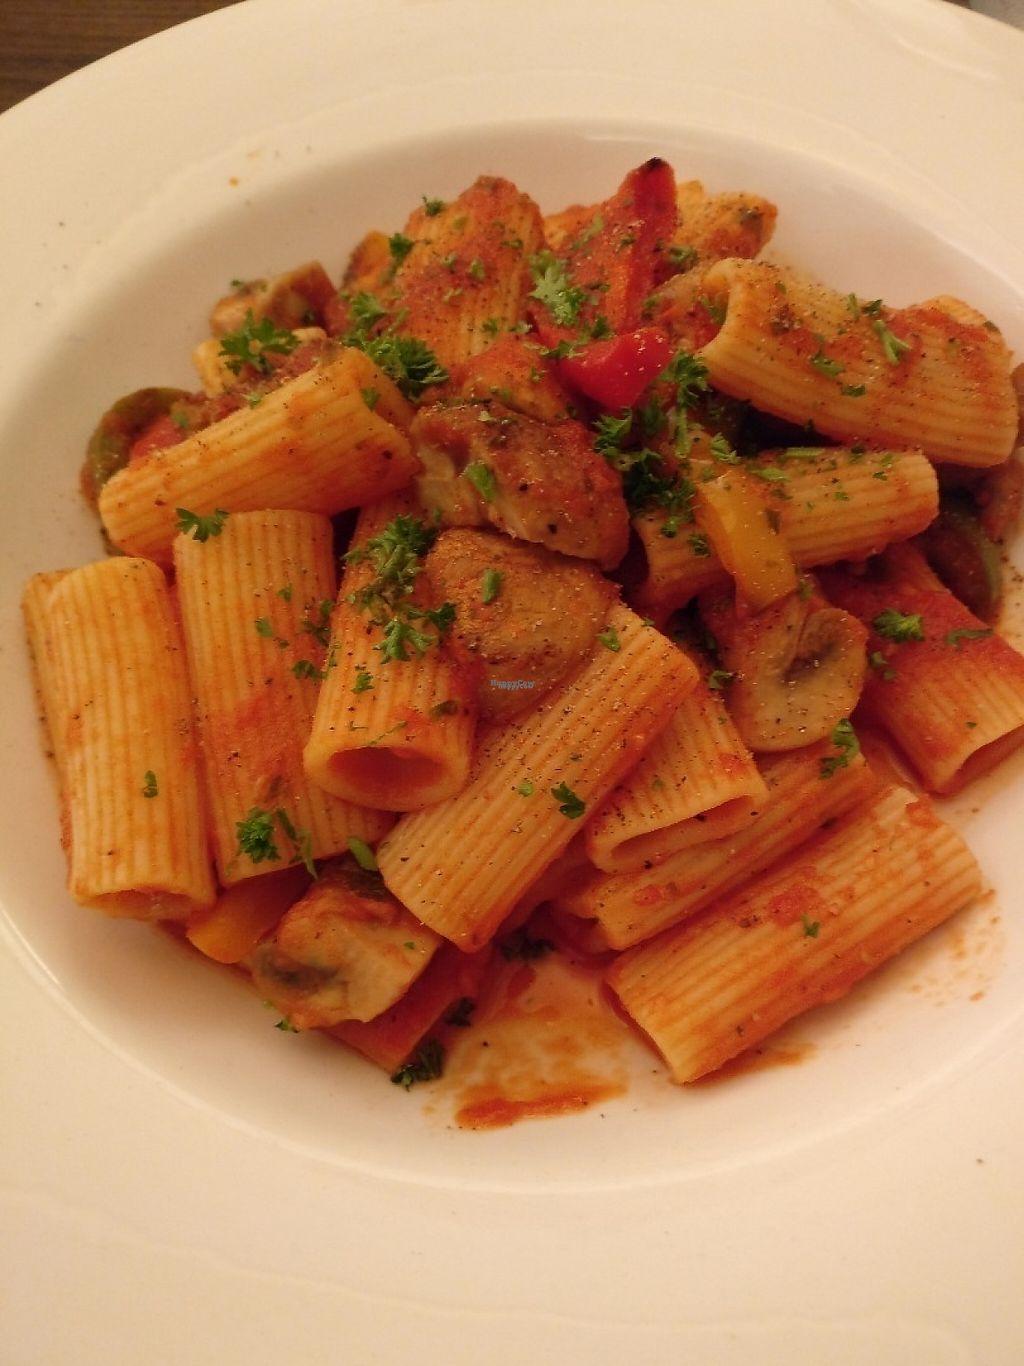 "Photo of Cardosi's  by <a href=""/members/profile/Agadooska"">Agadooska</a> <br/>Rigatoni in tomato sauce.  <br/> January 14, 2017  - <a href='/contact/abuse/image/85561/211970'>Report</a>"